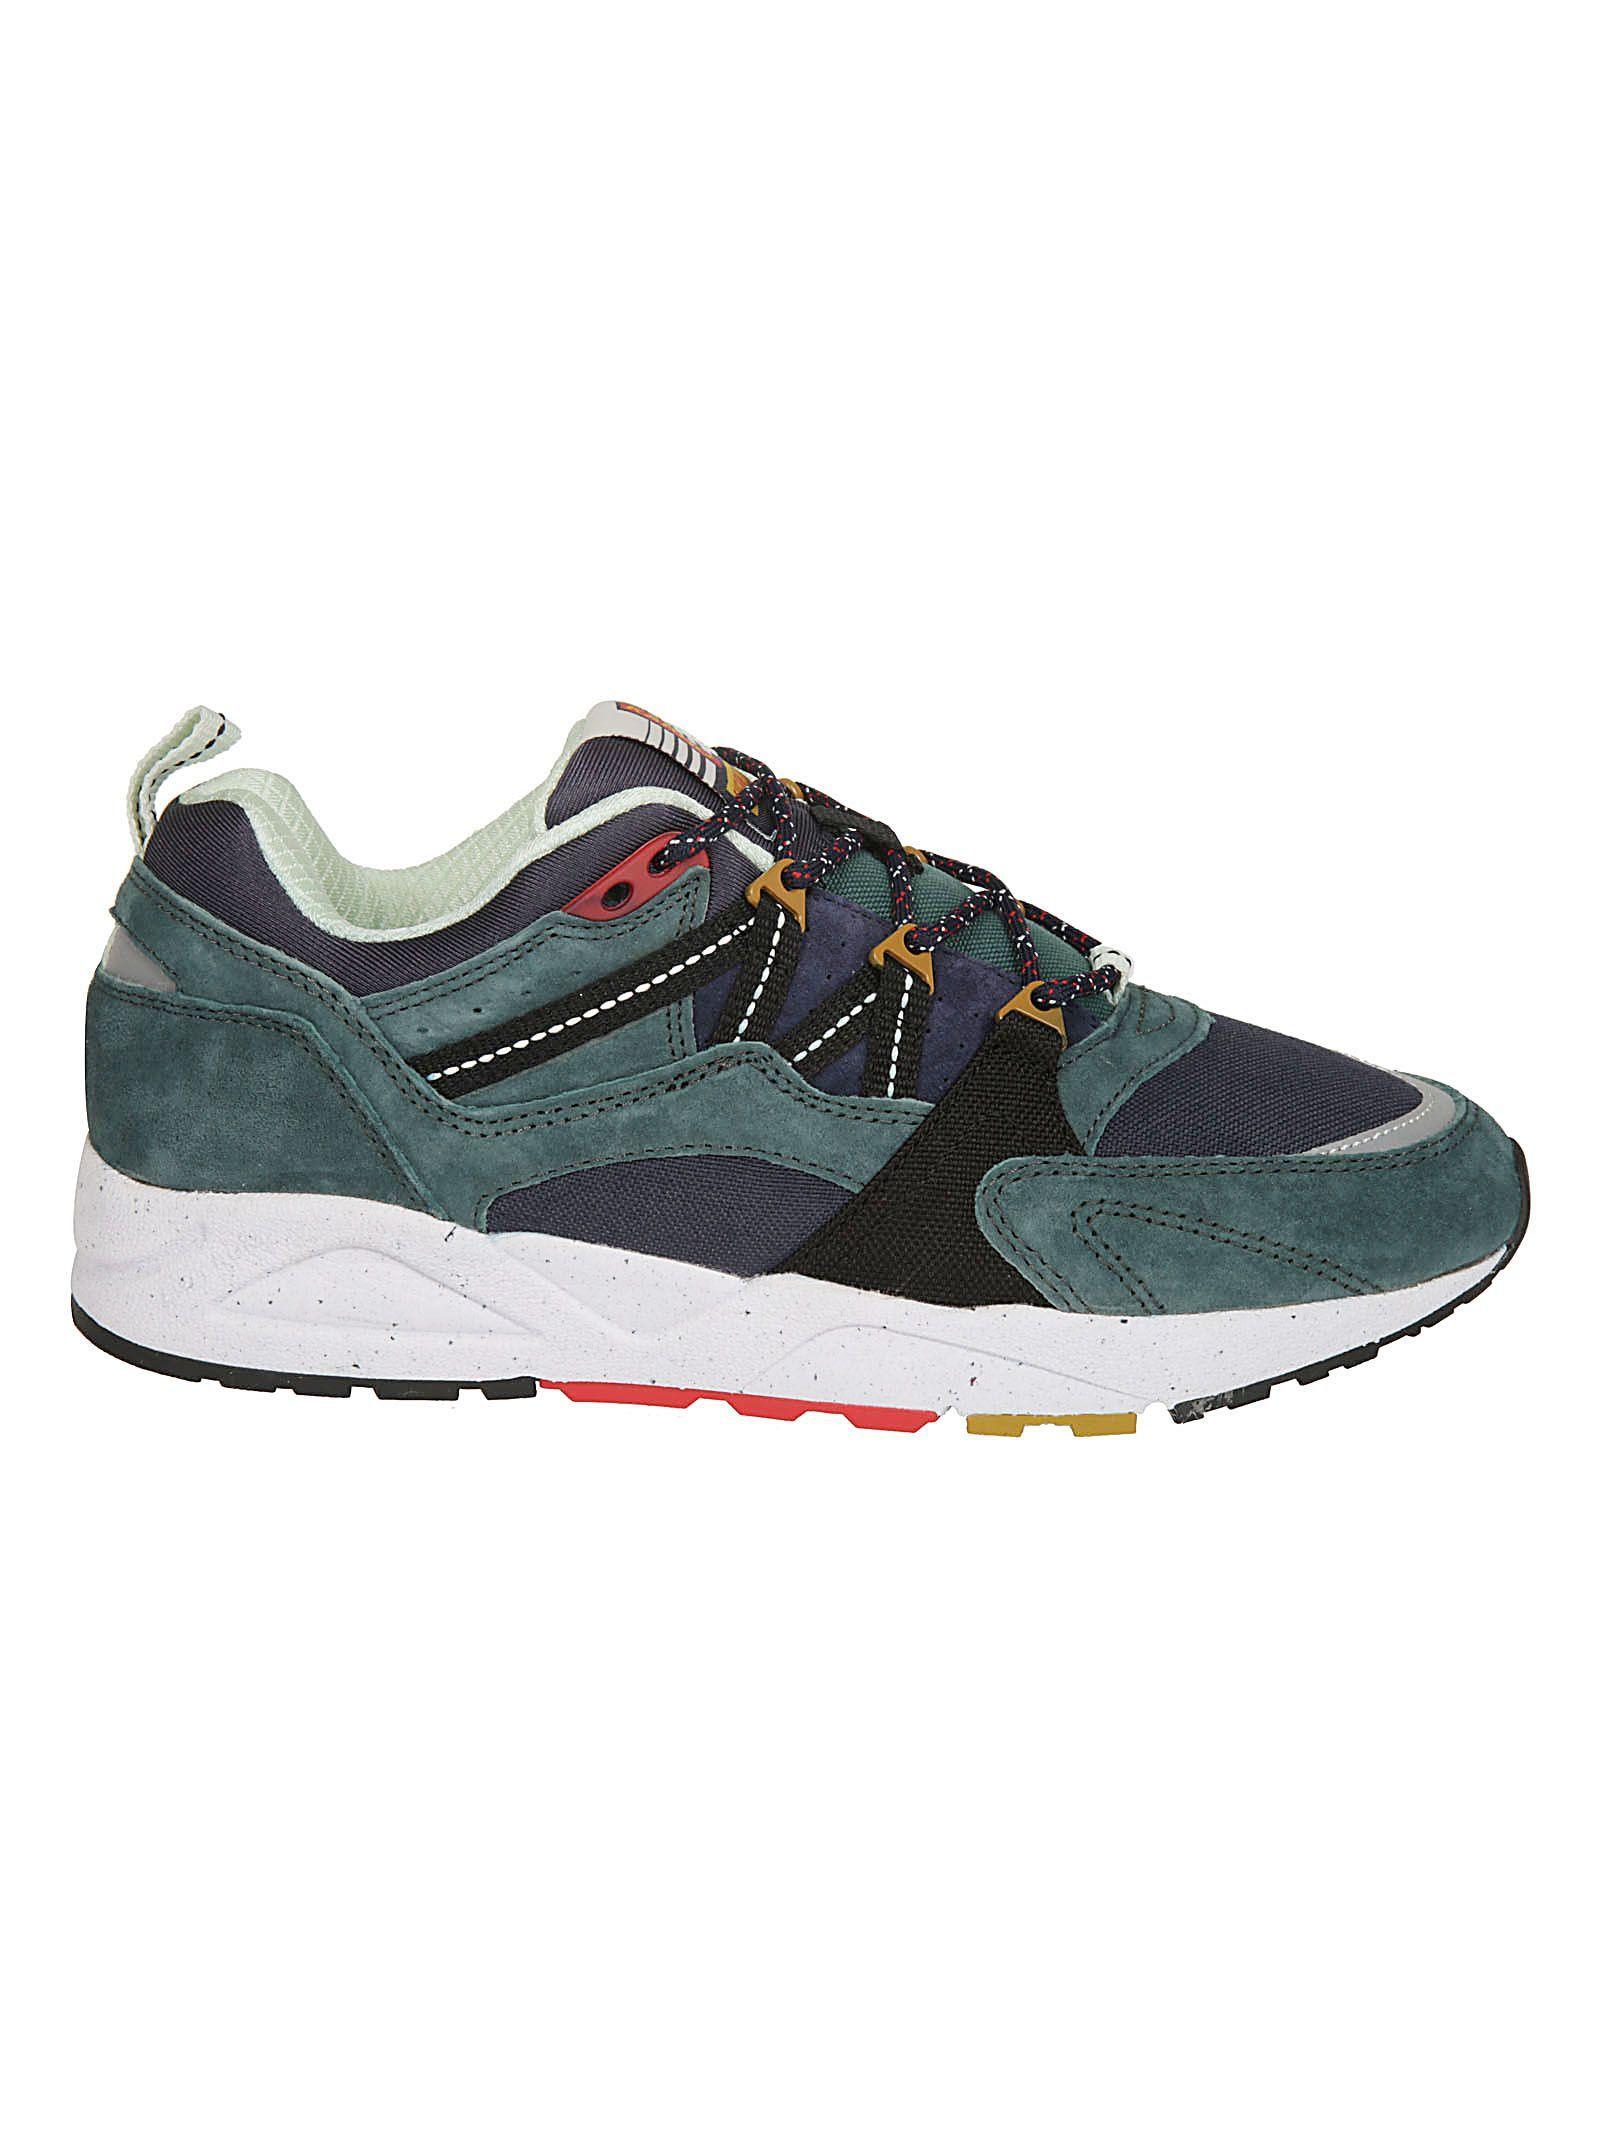 29565f3cad4182 KARHU FUSION 2.0 SNEAKERS.  karhu  shoes